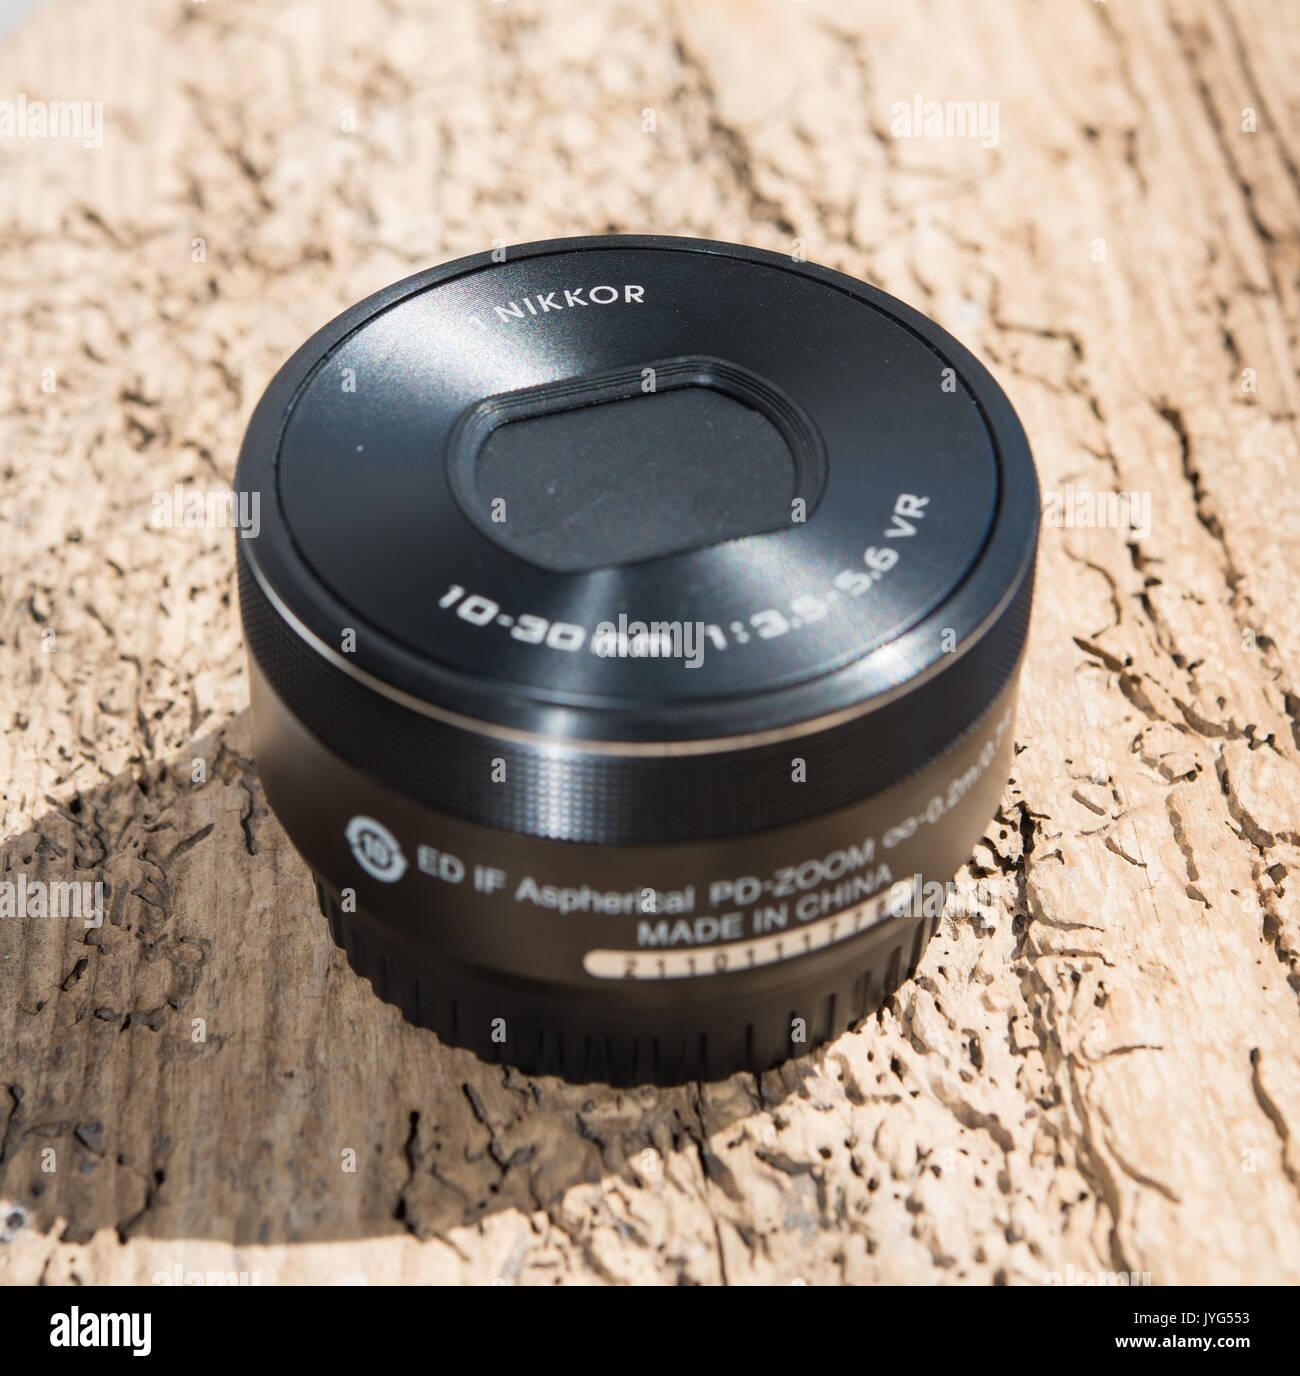 Nikon 1 Nikkor 10-30mm lens - Stock Image